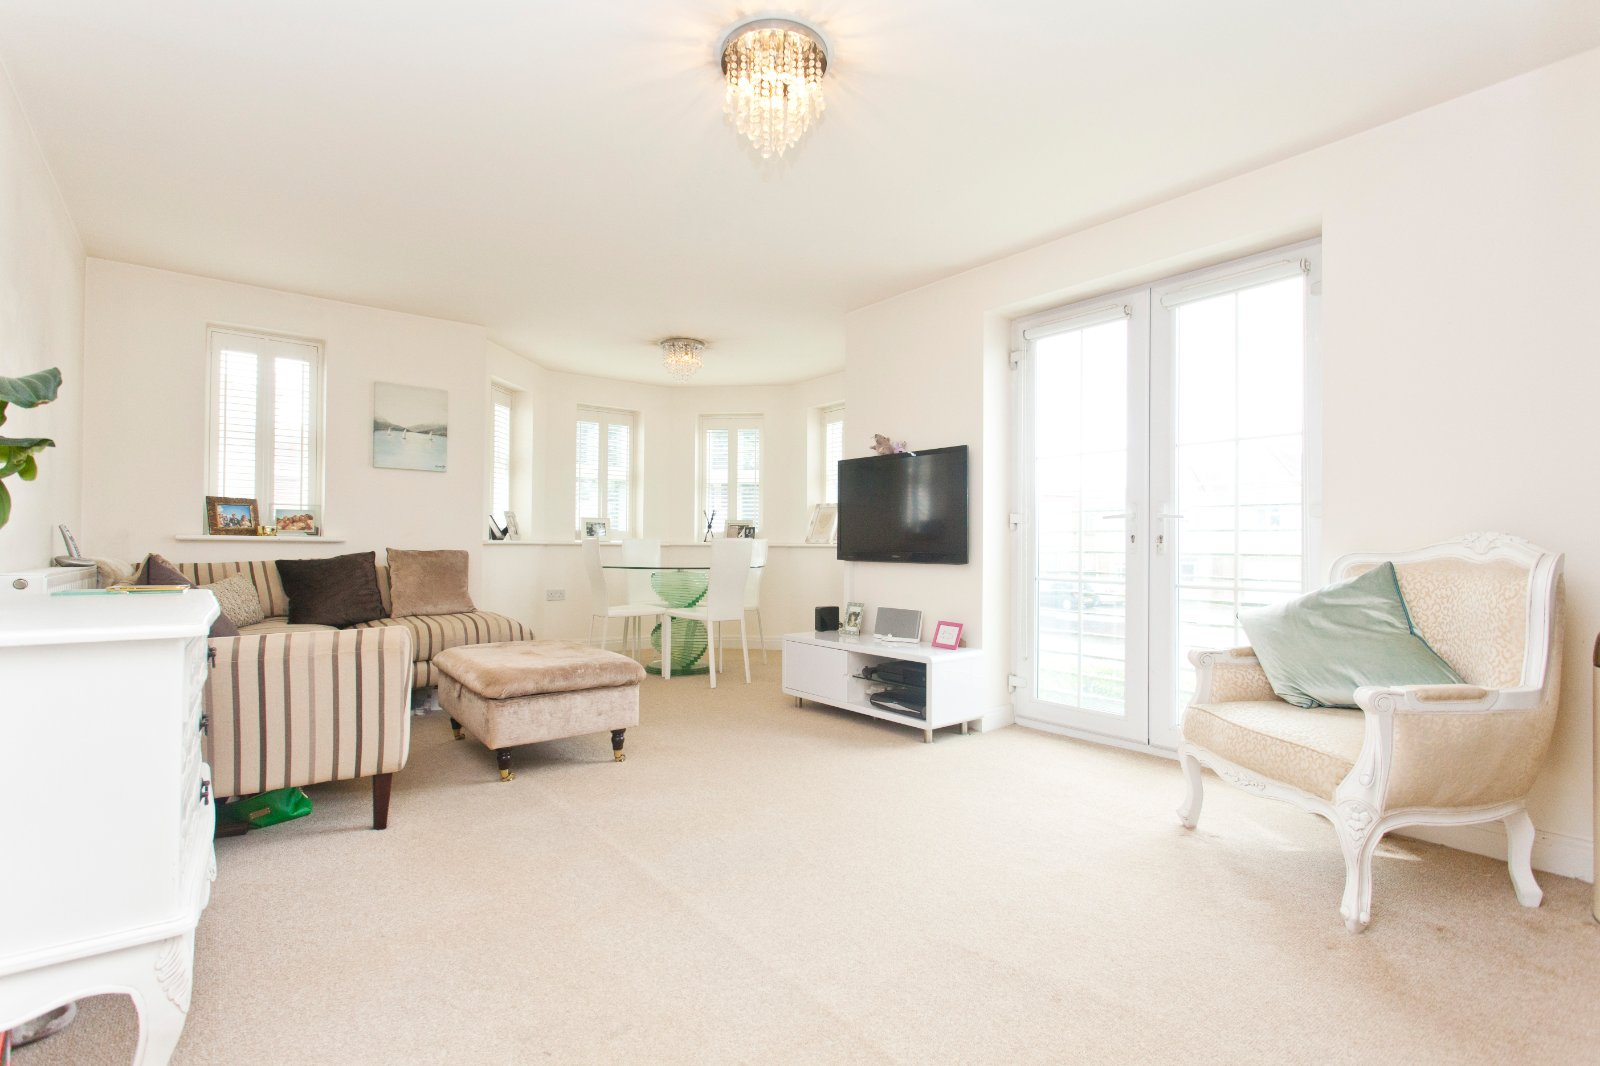 2 bed apartment for sale in Sanshore Court, 16 Glenair Avenue - Property Image 1